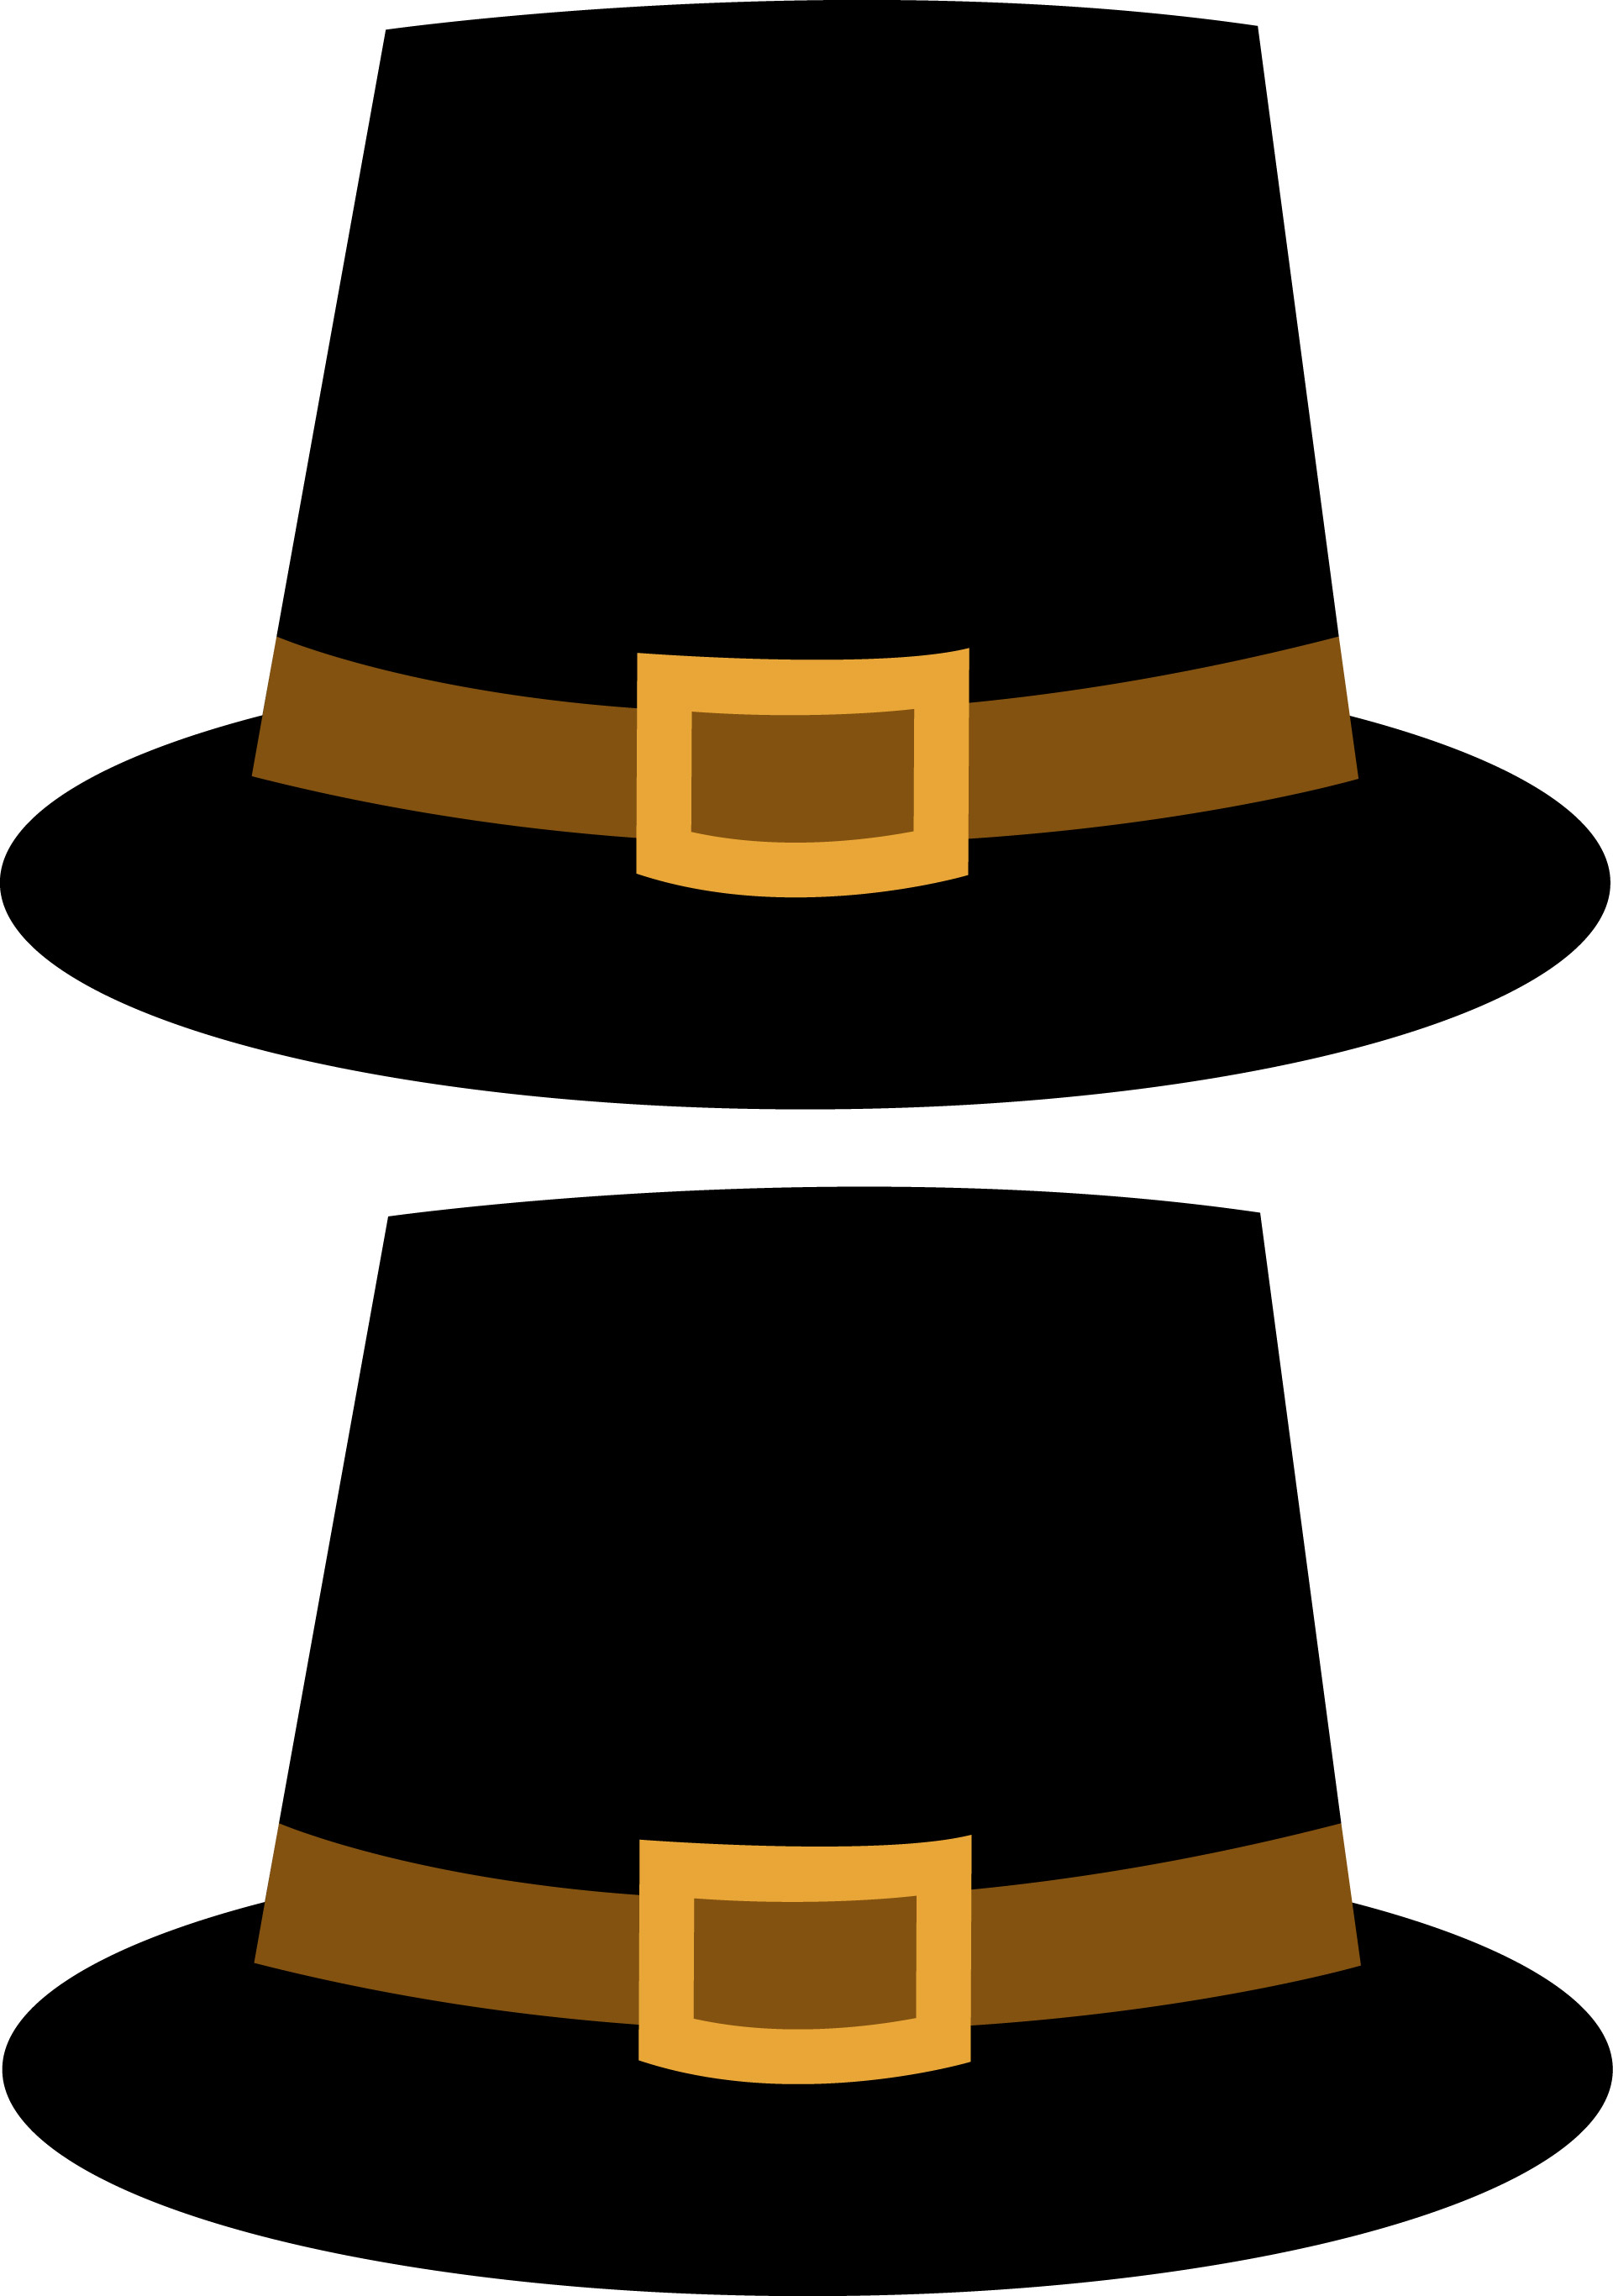 put on the hat clipart best pilgrim hat clip art free pilgrim hat clipart thanksgiving